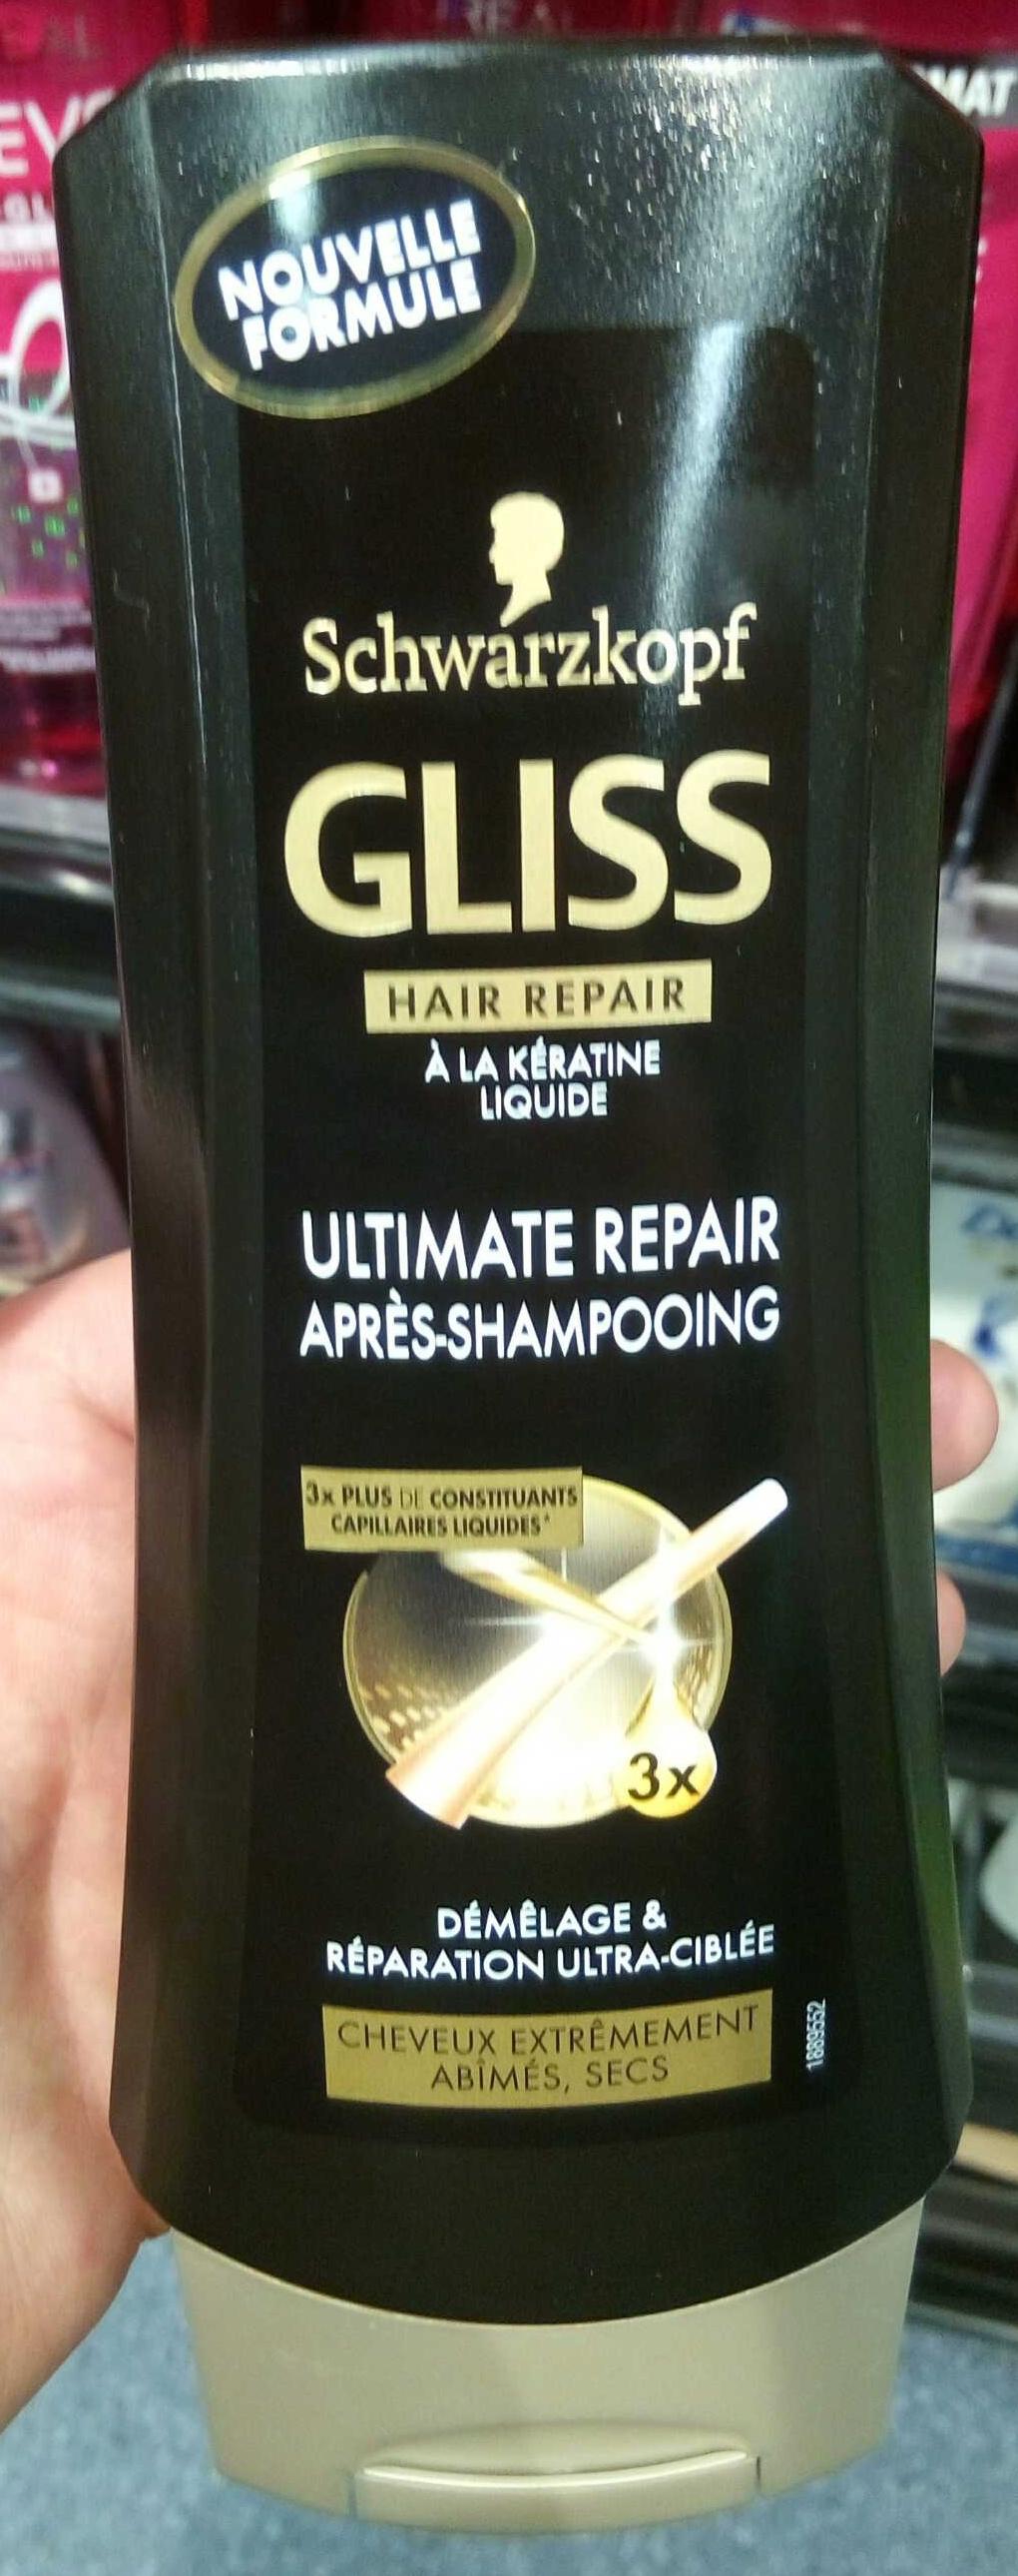 Gliss Hair Repair Ultimate Repair Après-shampooing - Product